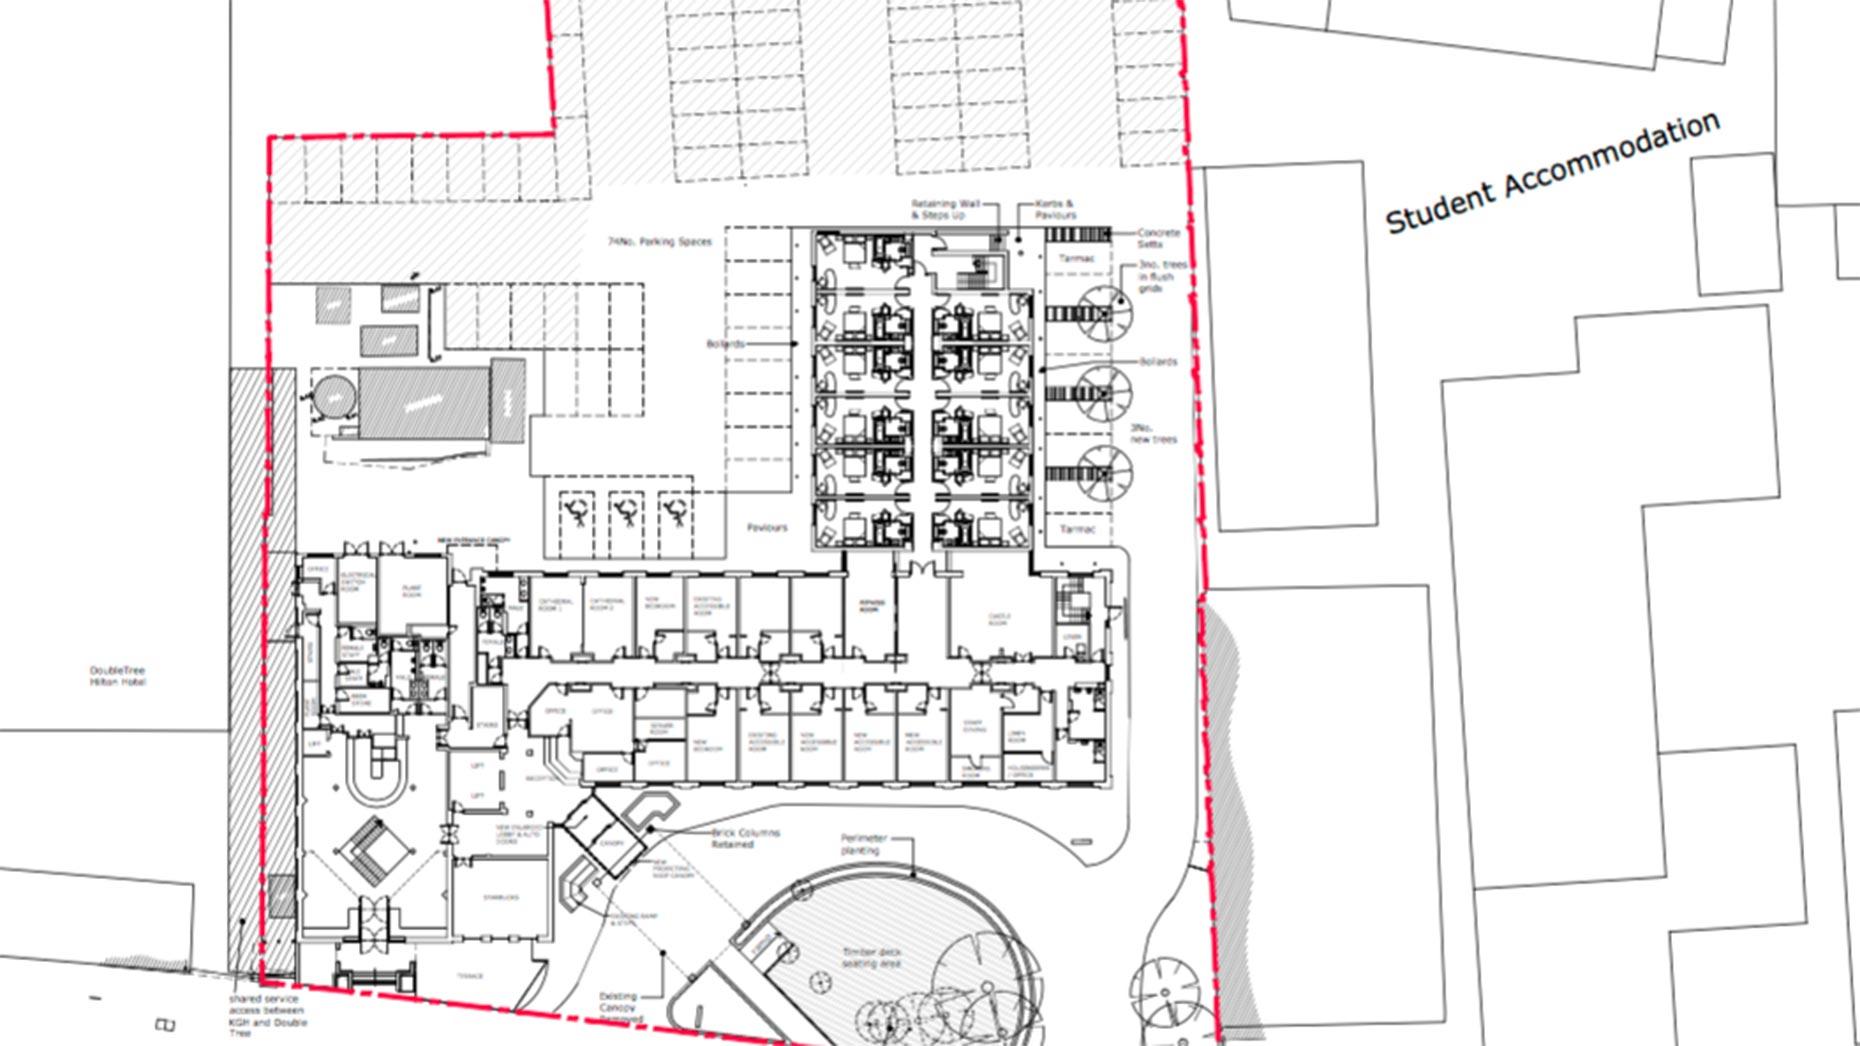 Holiday Inn site plan